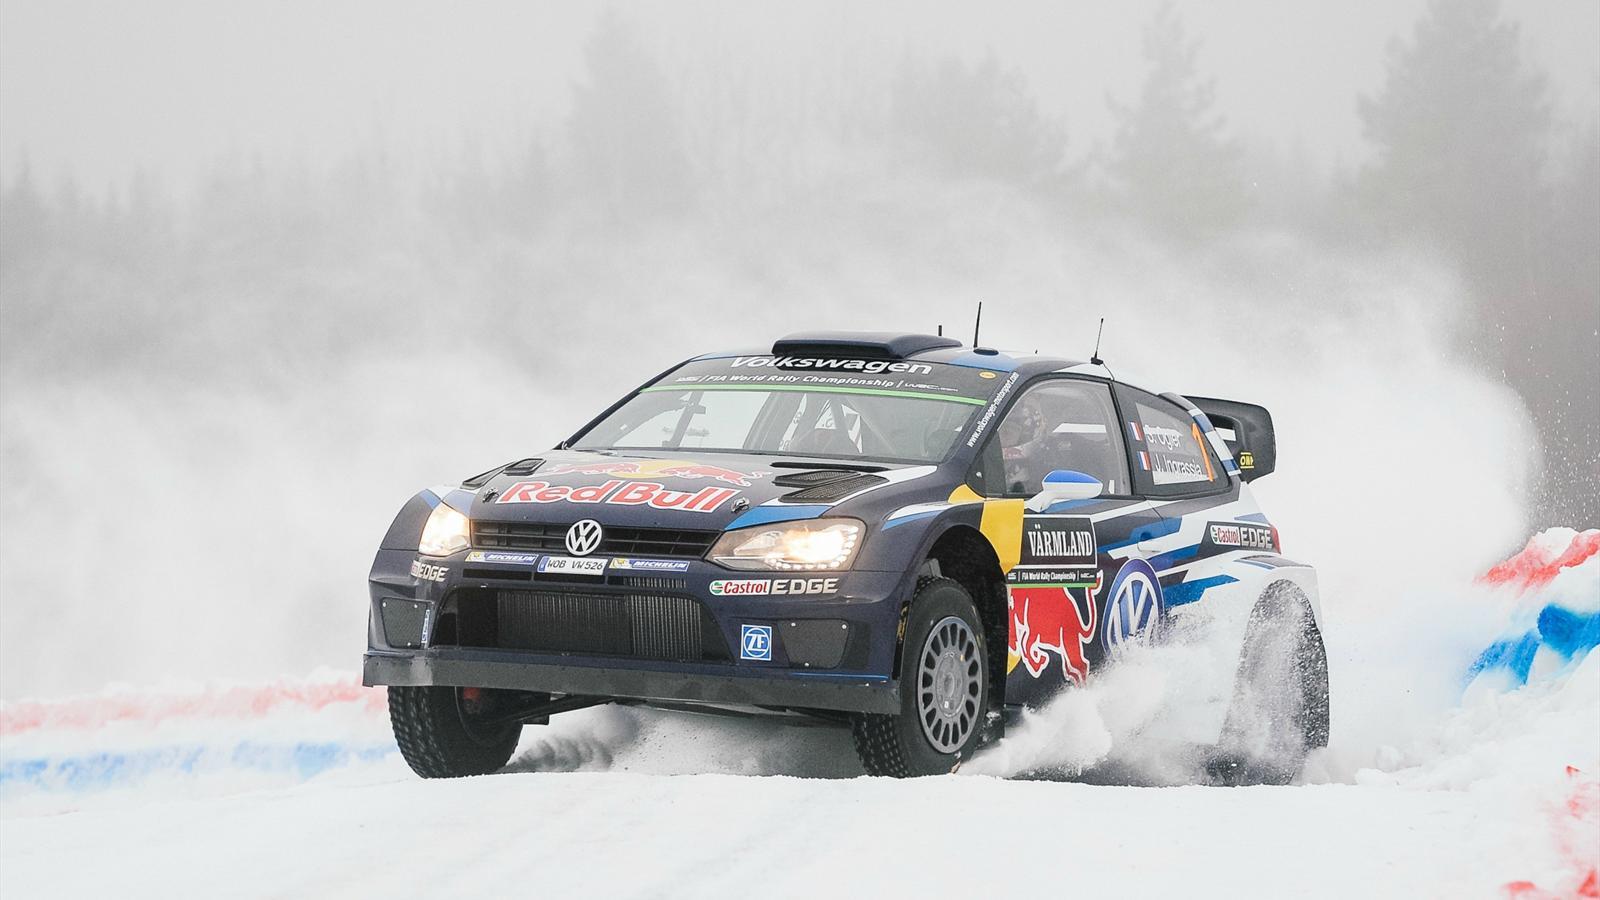 s 233 bastien ogier volkswagen remporte une deuxi 232 me victoire historique rallye de su 232 de 2015